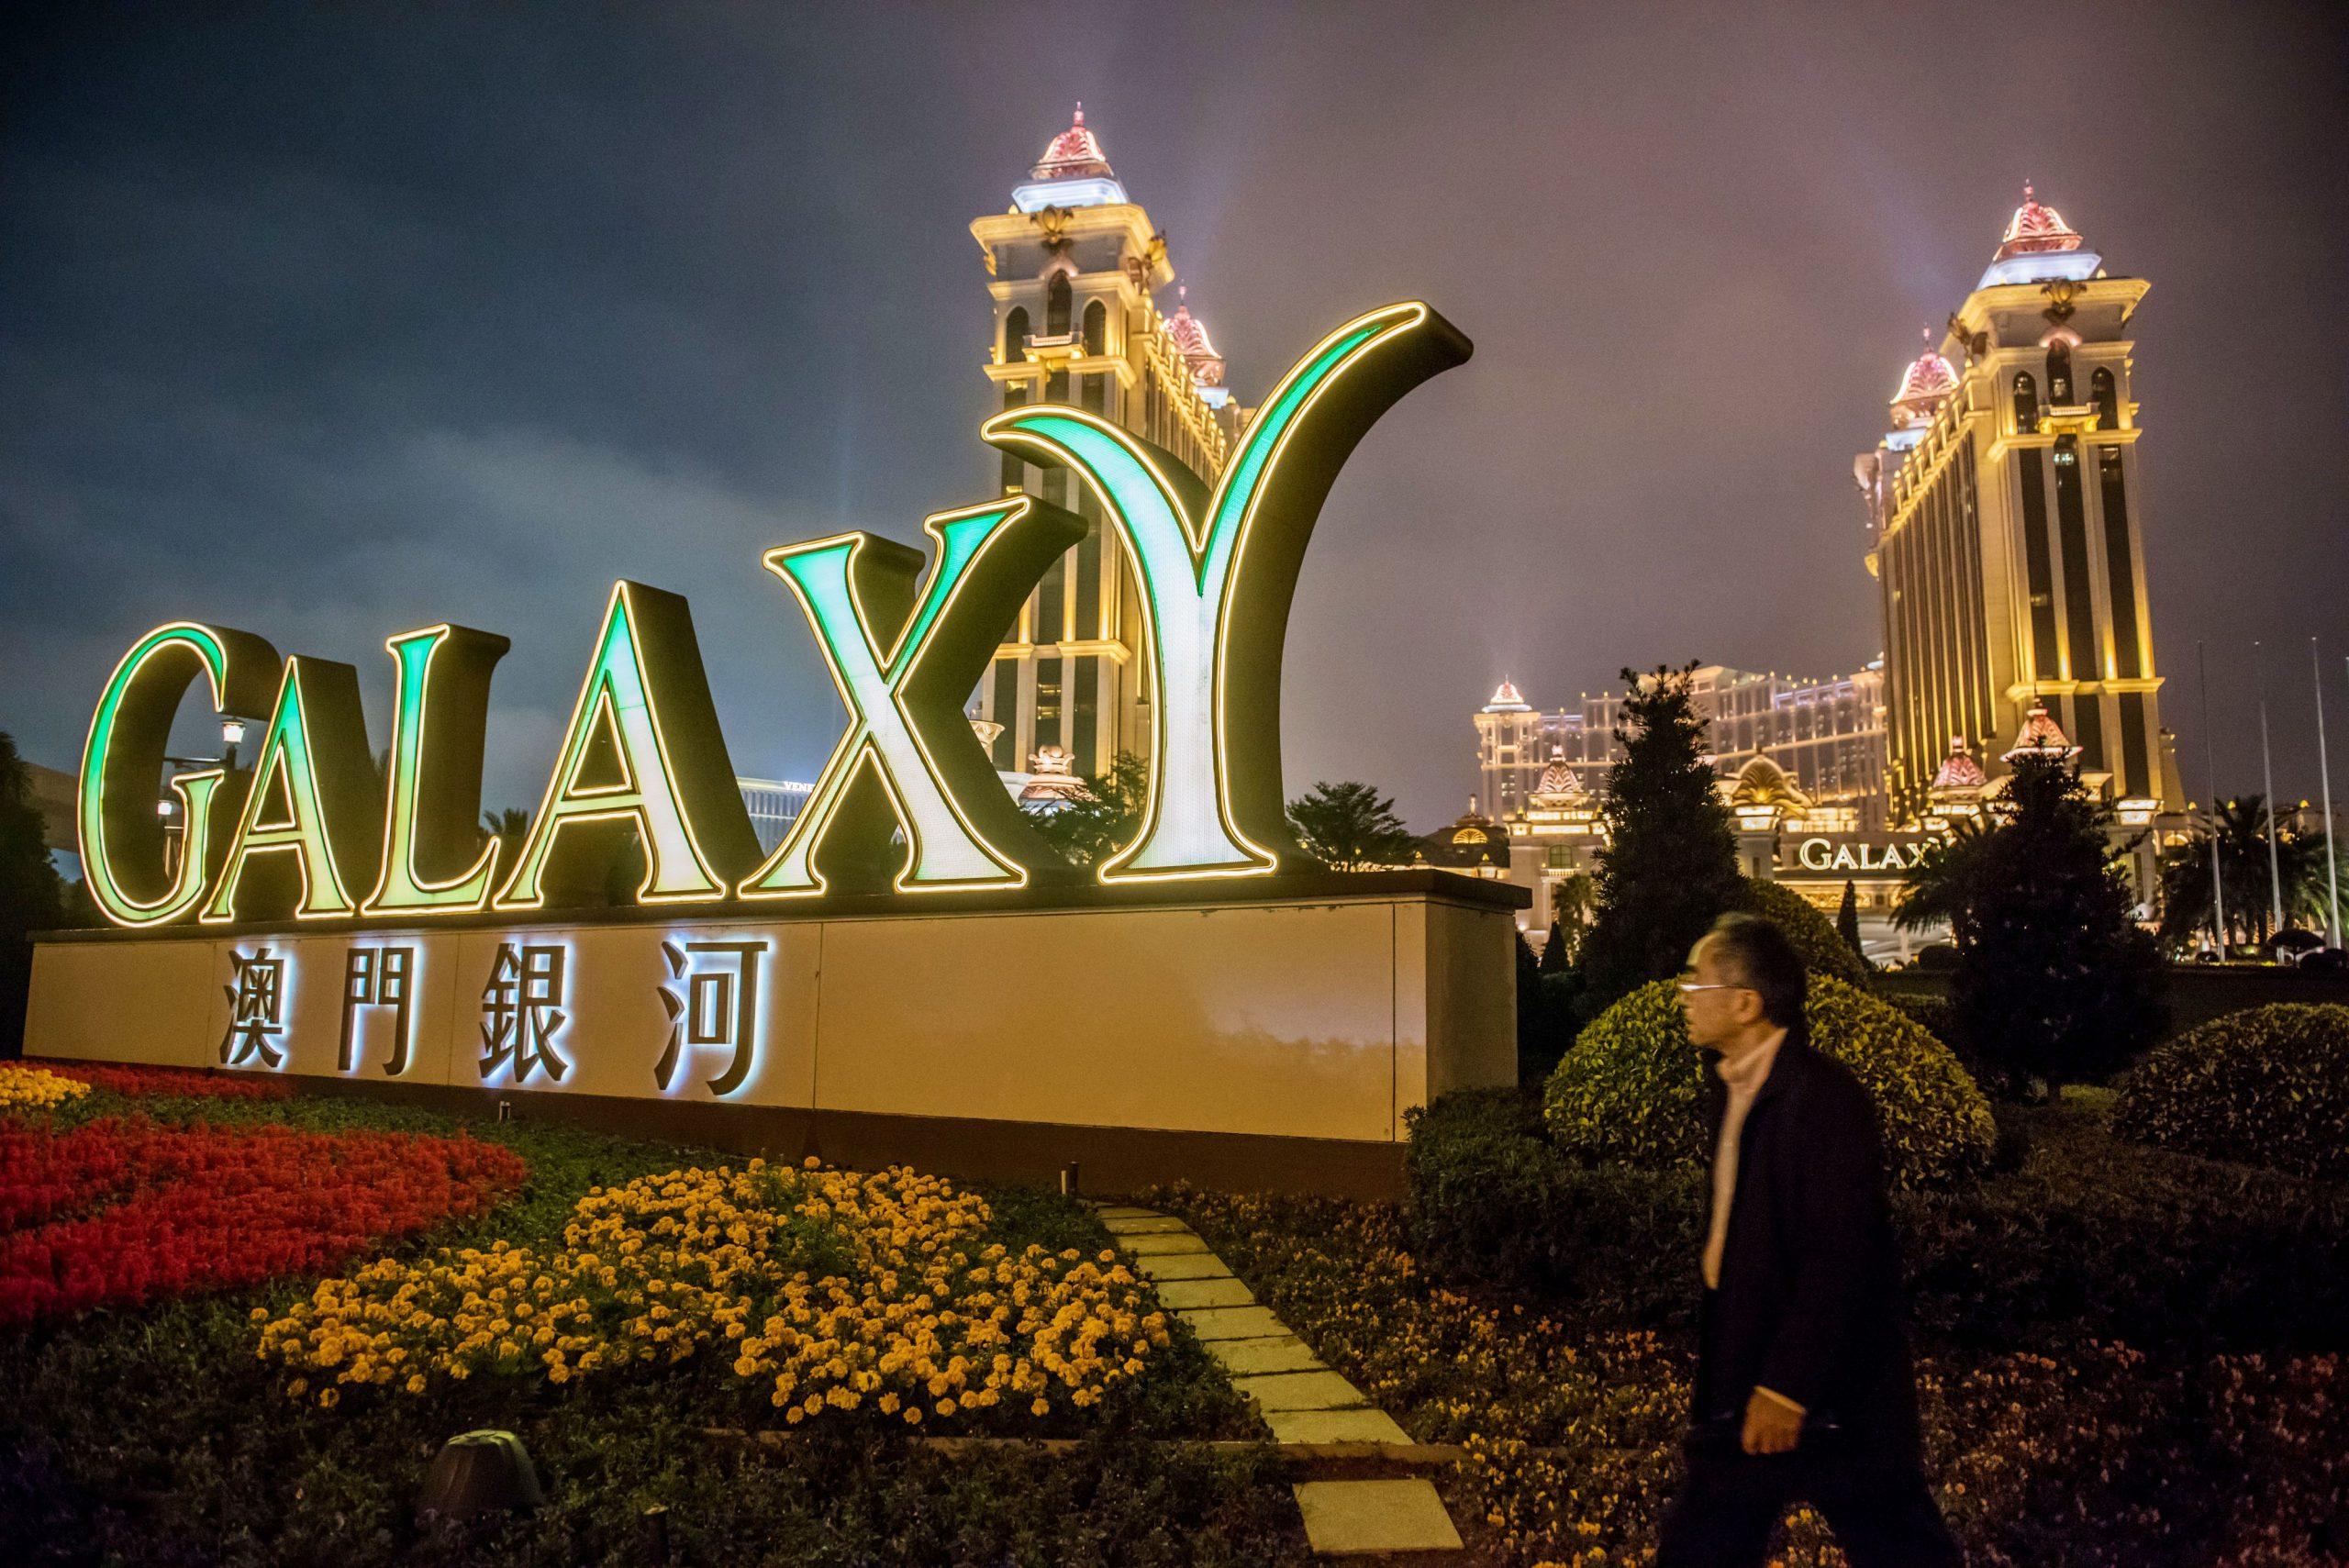 Galaxy Ent Praise Macau Govt For Decisive & Proactive Leadership